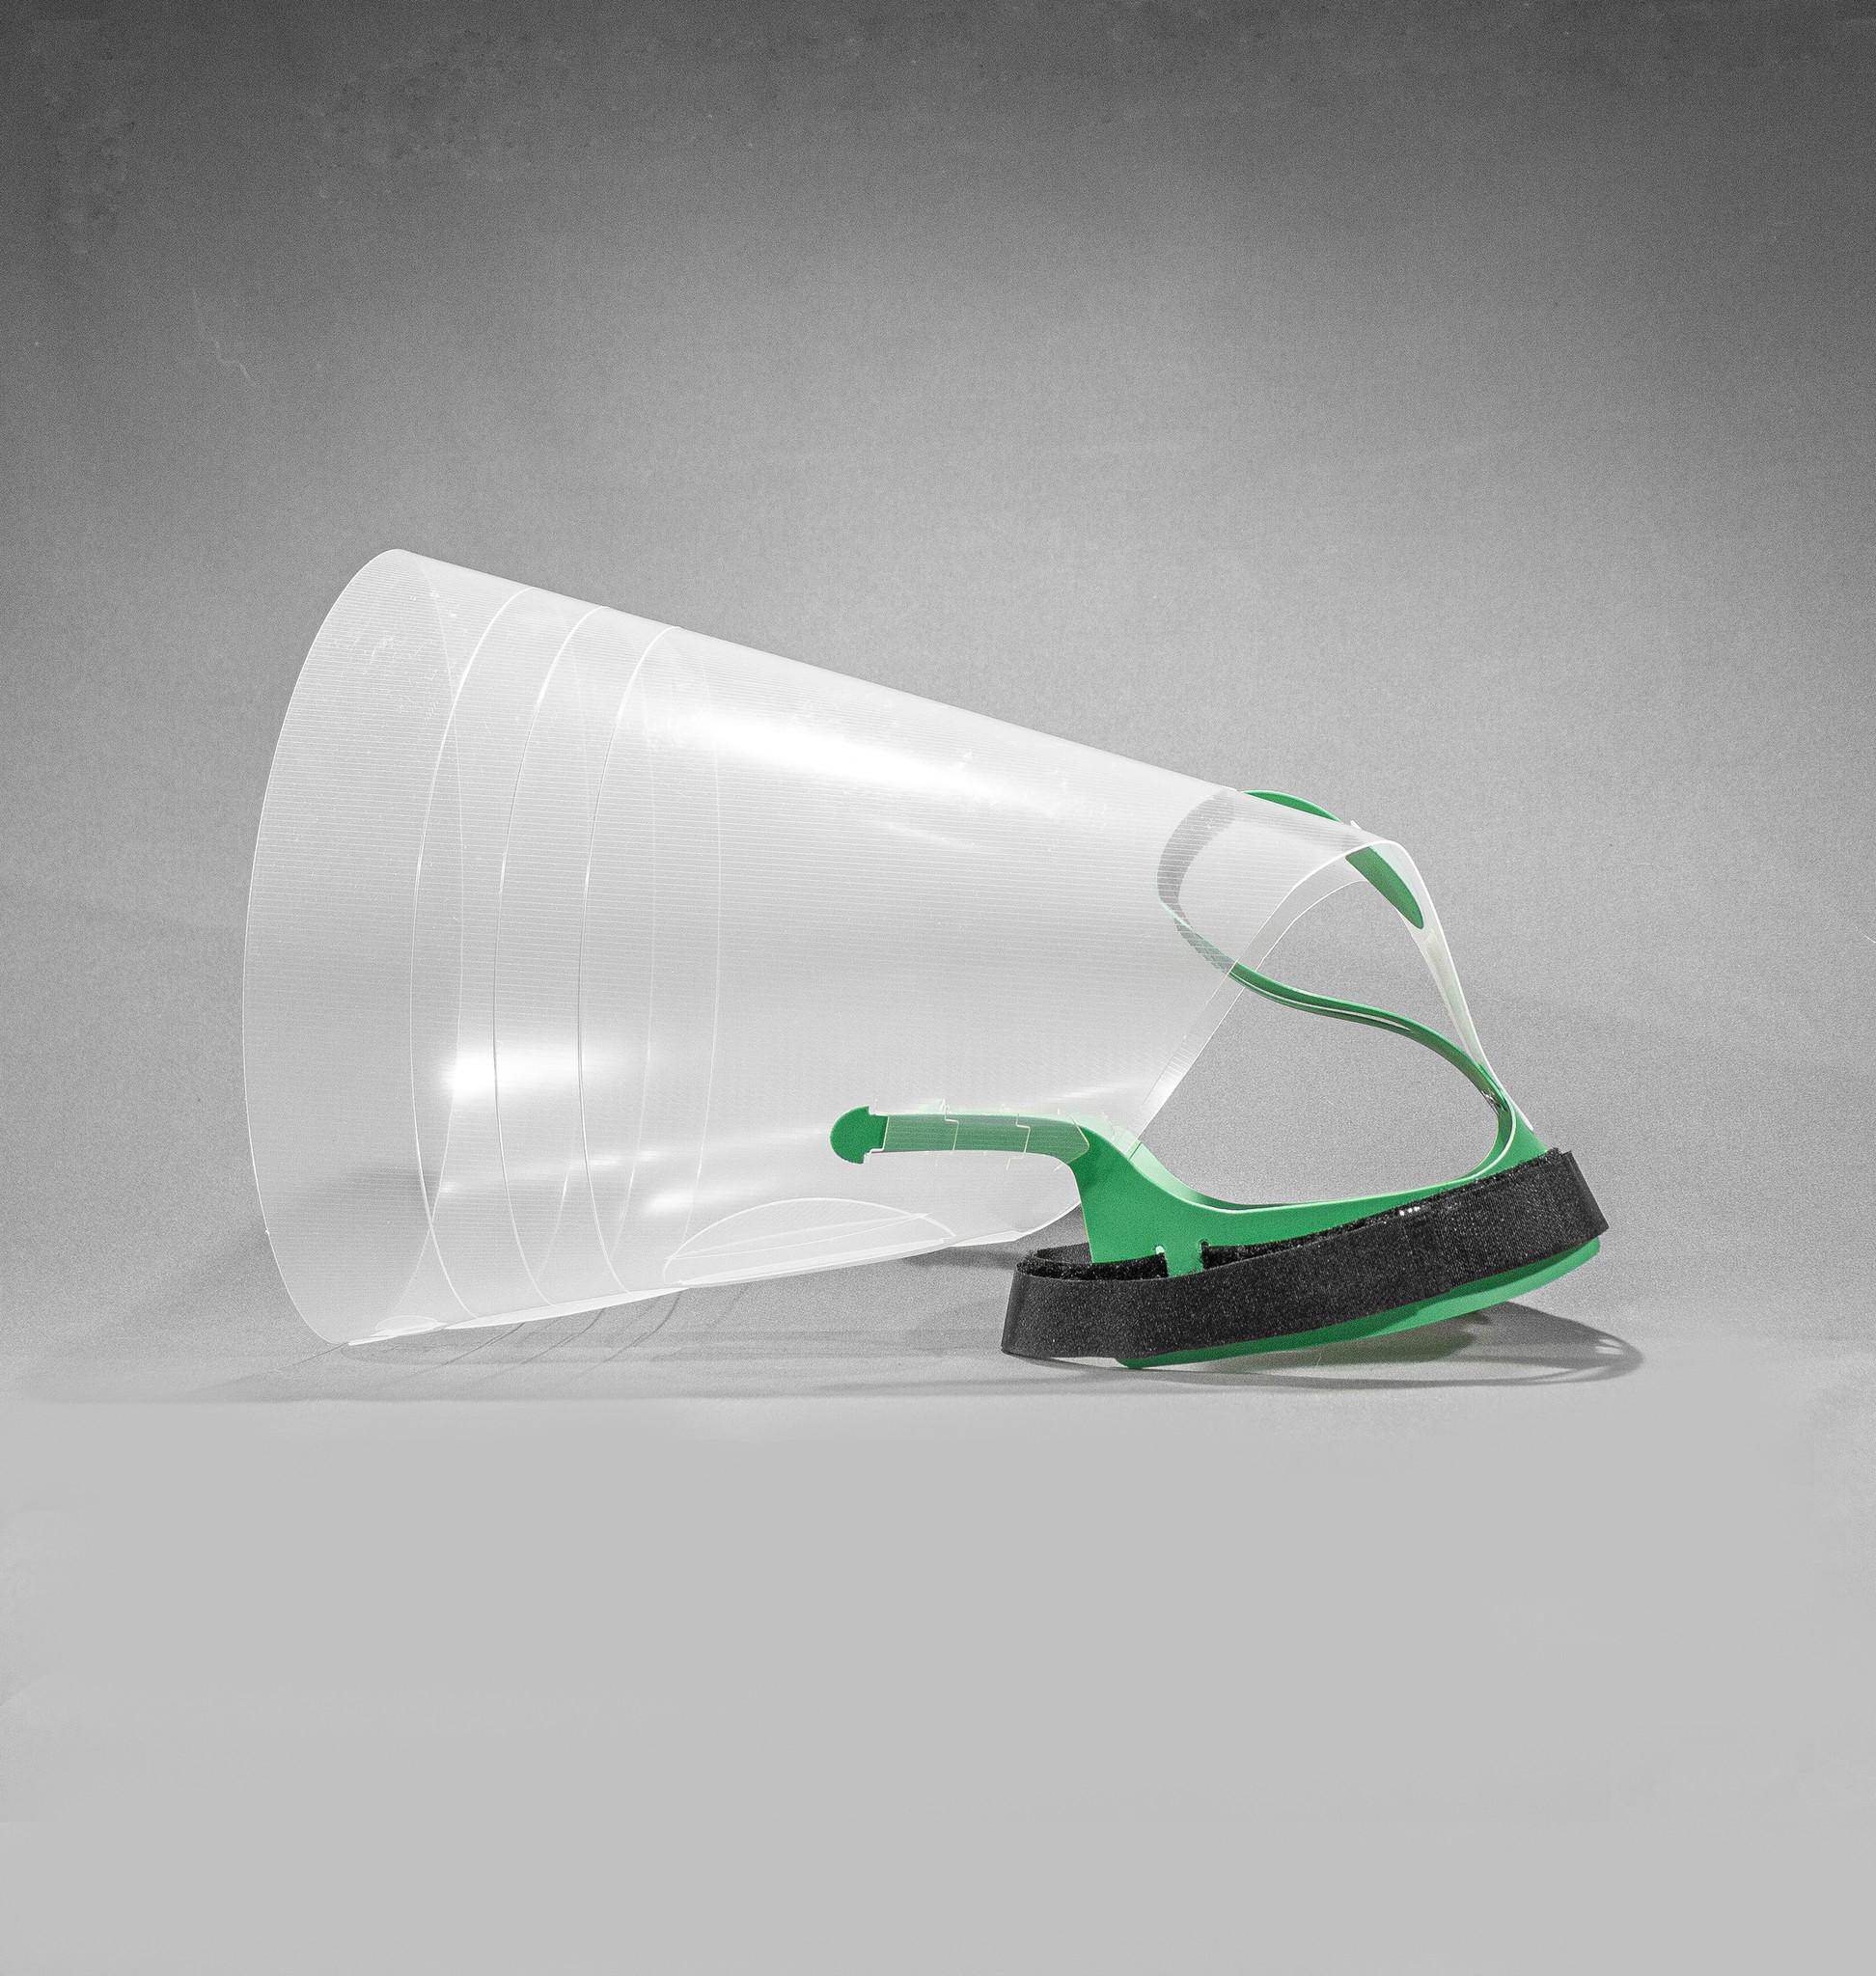 NOVAGUARD NOVAGUARD lick protection PN407, size: medium, color: green